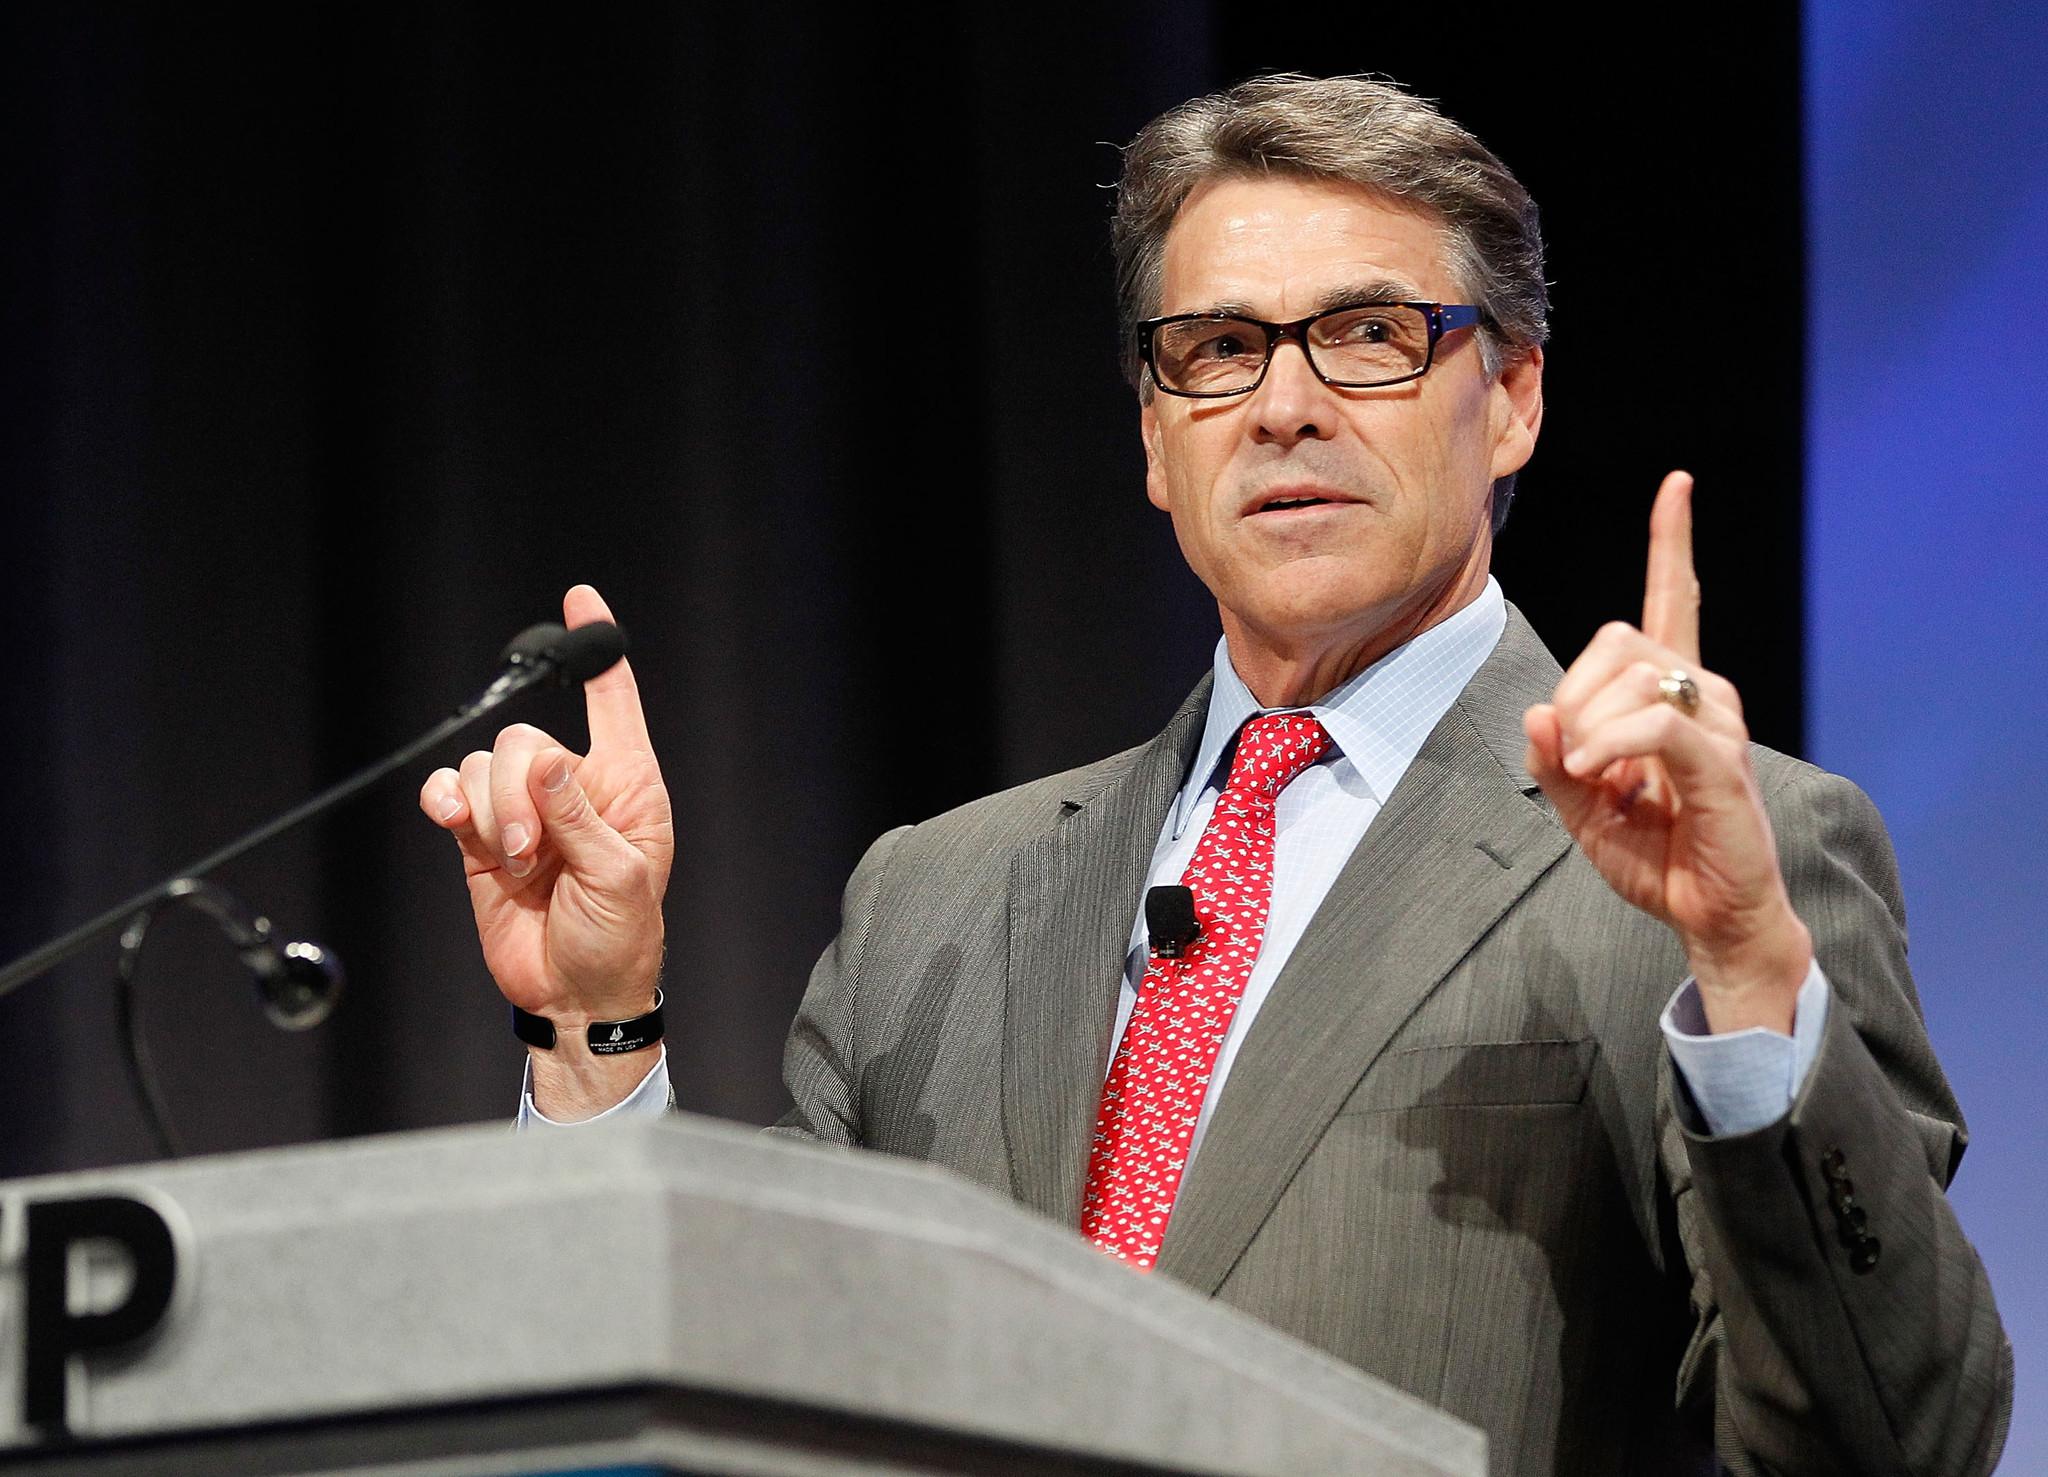 Rick Perry, Rand Paul take aim at Obama, Hillary Clinton at Koch event